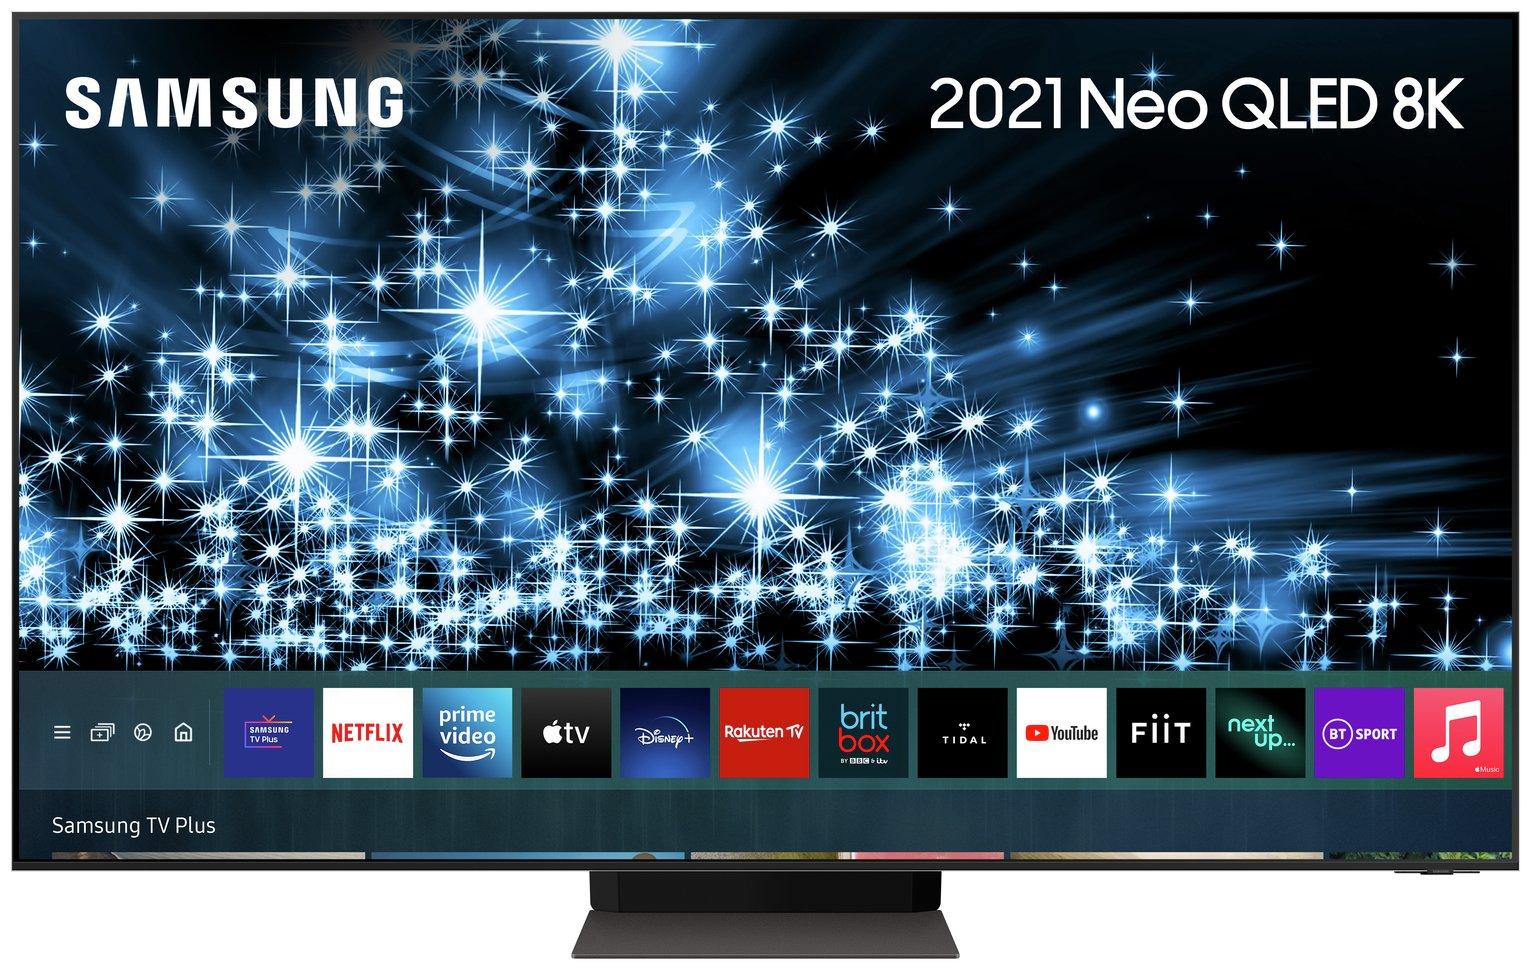 Samsung 65 inch QN700A Neo QLED 8K HDR 2000 Smart TV (2021)